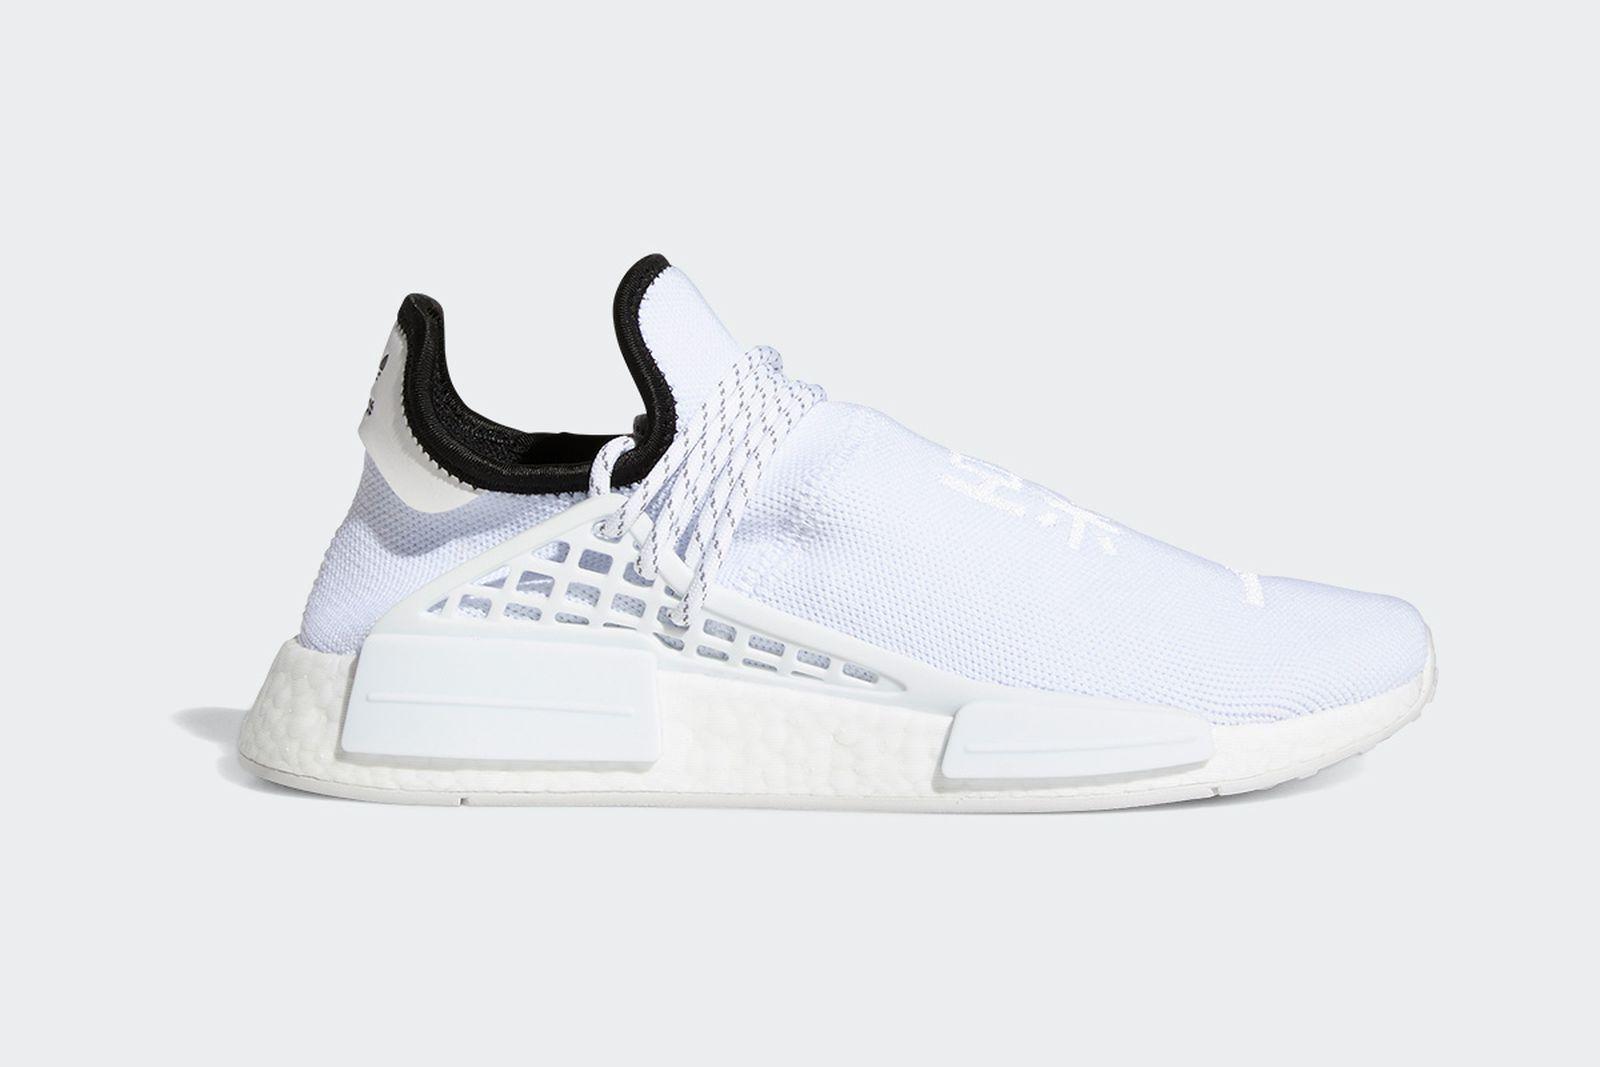 pharrell-williams-adidas-hu-nmd-white-release-date-price-05